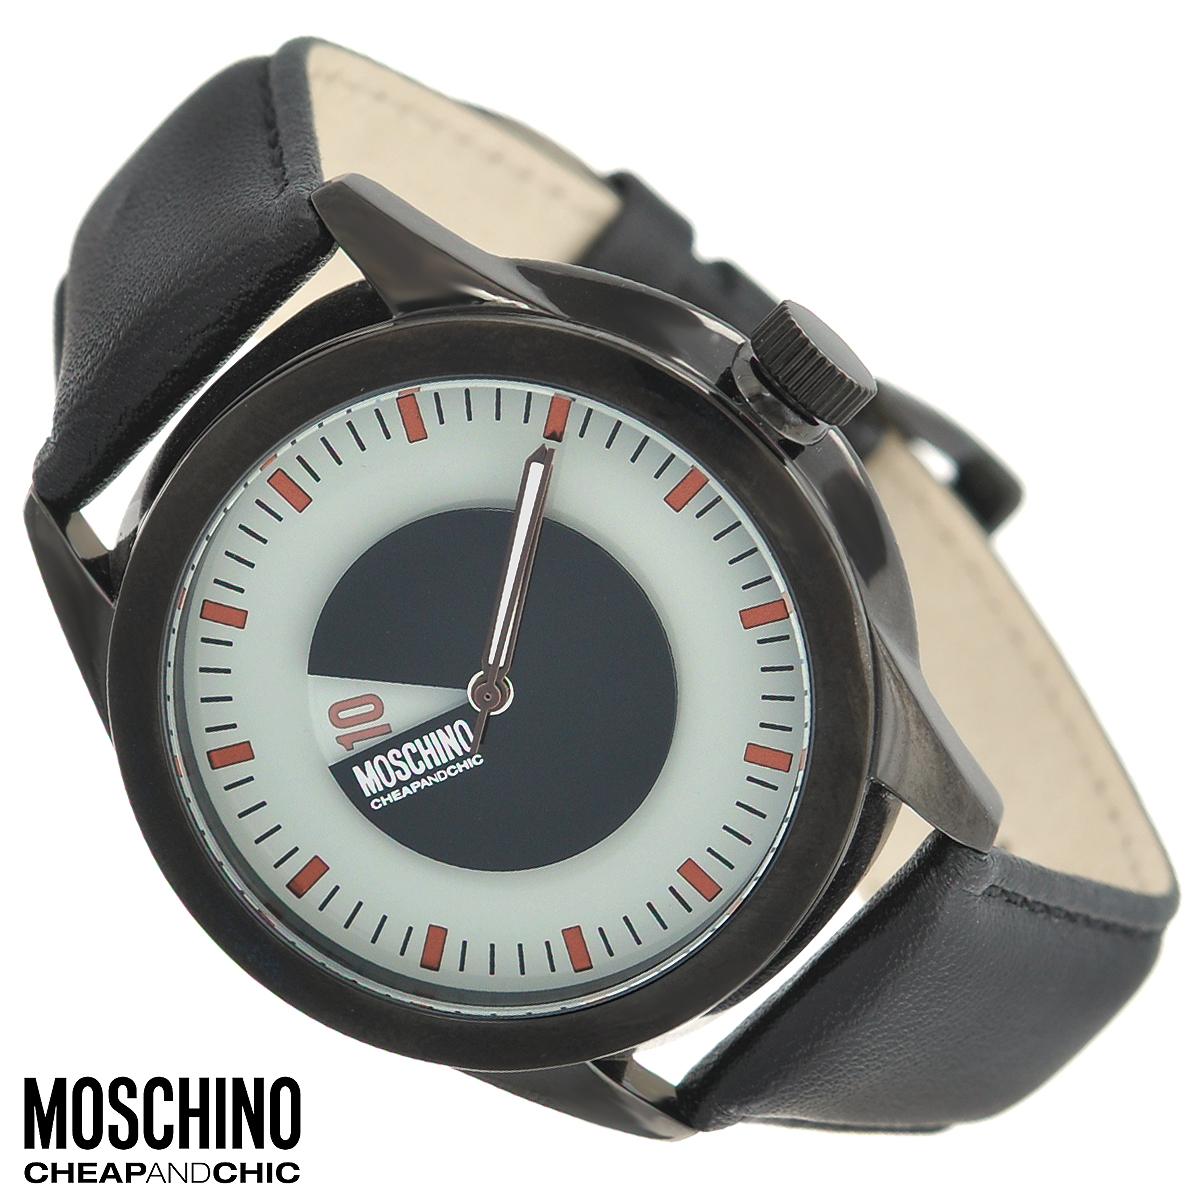 ���� �������� Moschino, ����: ������. MW0340 - MoschinoMW0340�������� ���� �� ���������� ������������ ������ Moschino - ��� �� ������ �������� � �������������� ���������, �� � ����������� ���������, ������������ � ��������������� �������� � �����������������. ���� Moschino ����������� ������� �������� ��������� ����������. ������ �������� �� ������������������ ����������� �����. ��������� � ��������� ������� � ��������� ������� ����������� �������. ���� ����� ��� ������� - ������� � ��������. ������� ����� �������� �� ����������� ���� � ������� ������������ ���������. ���� ��������� � ��������� ������������� ������� � ��������� ������. ���� Moschino ��������� ������ ����������� ������� ���������� �� ����� ������ ����� ������������� ������������, �����������������, � ����� ������� ���������� ����������� �������. ������ ������ ������� ������ �����������������, ������������ �, ����������, ������������ ����. ��������������: ������� ����������: 3,5 ��. ������ �������: 3,9 �� � 3,9 �� �...